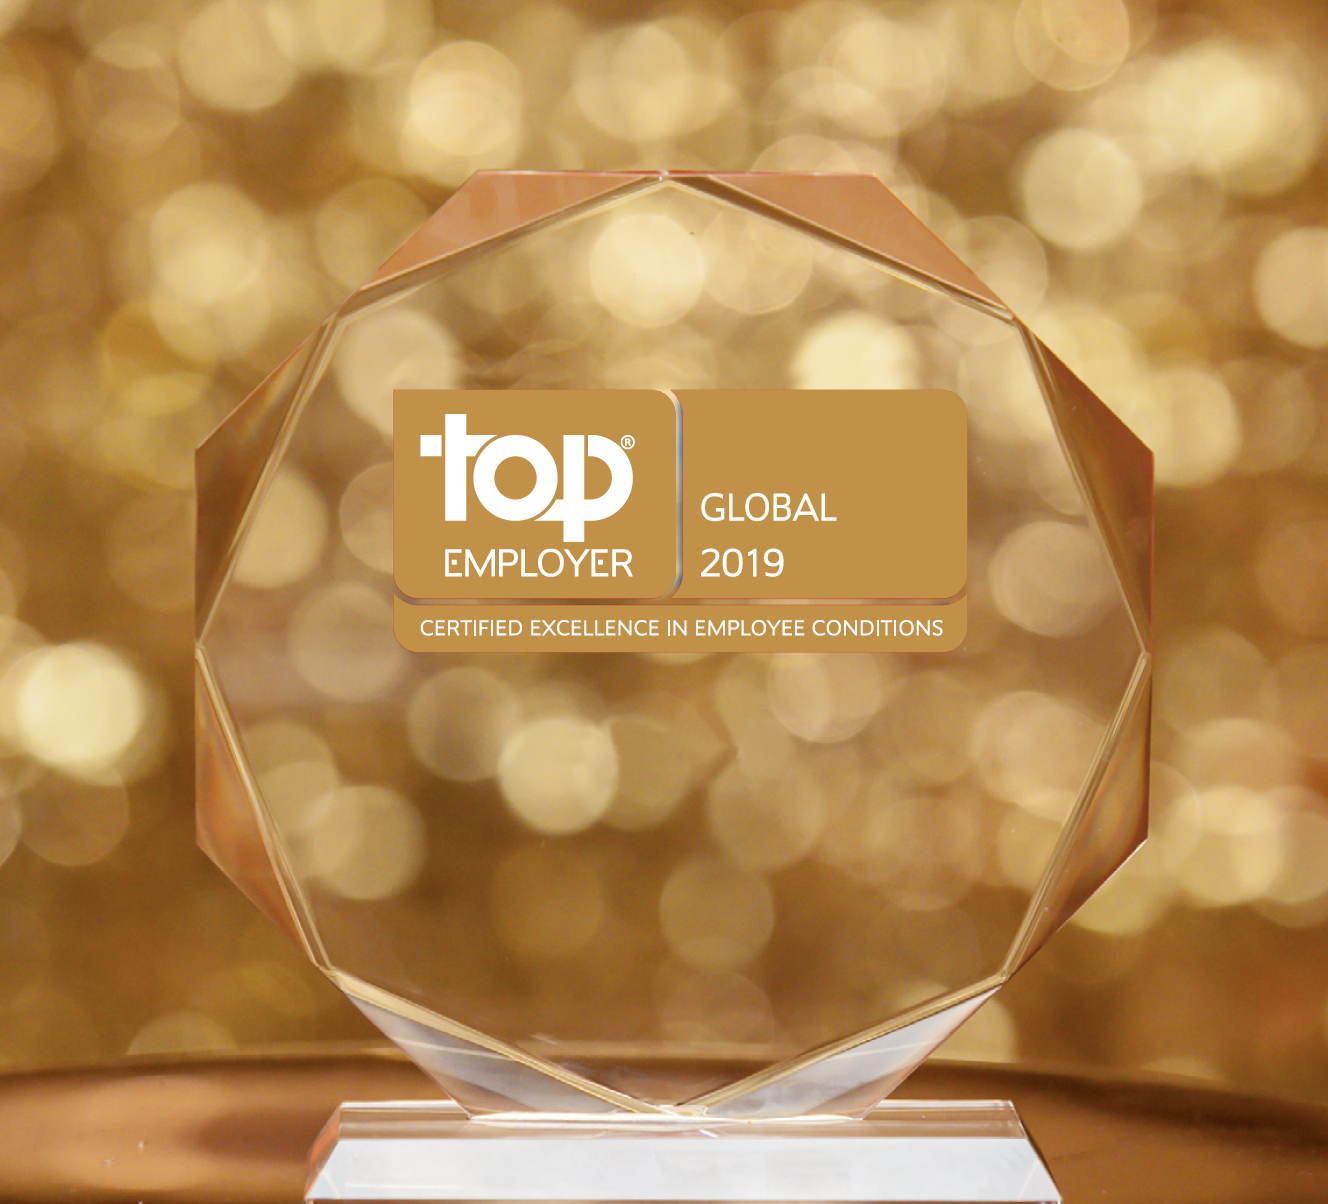 top employer institute certifie - HD1328×1204